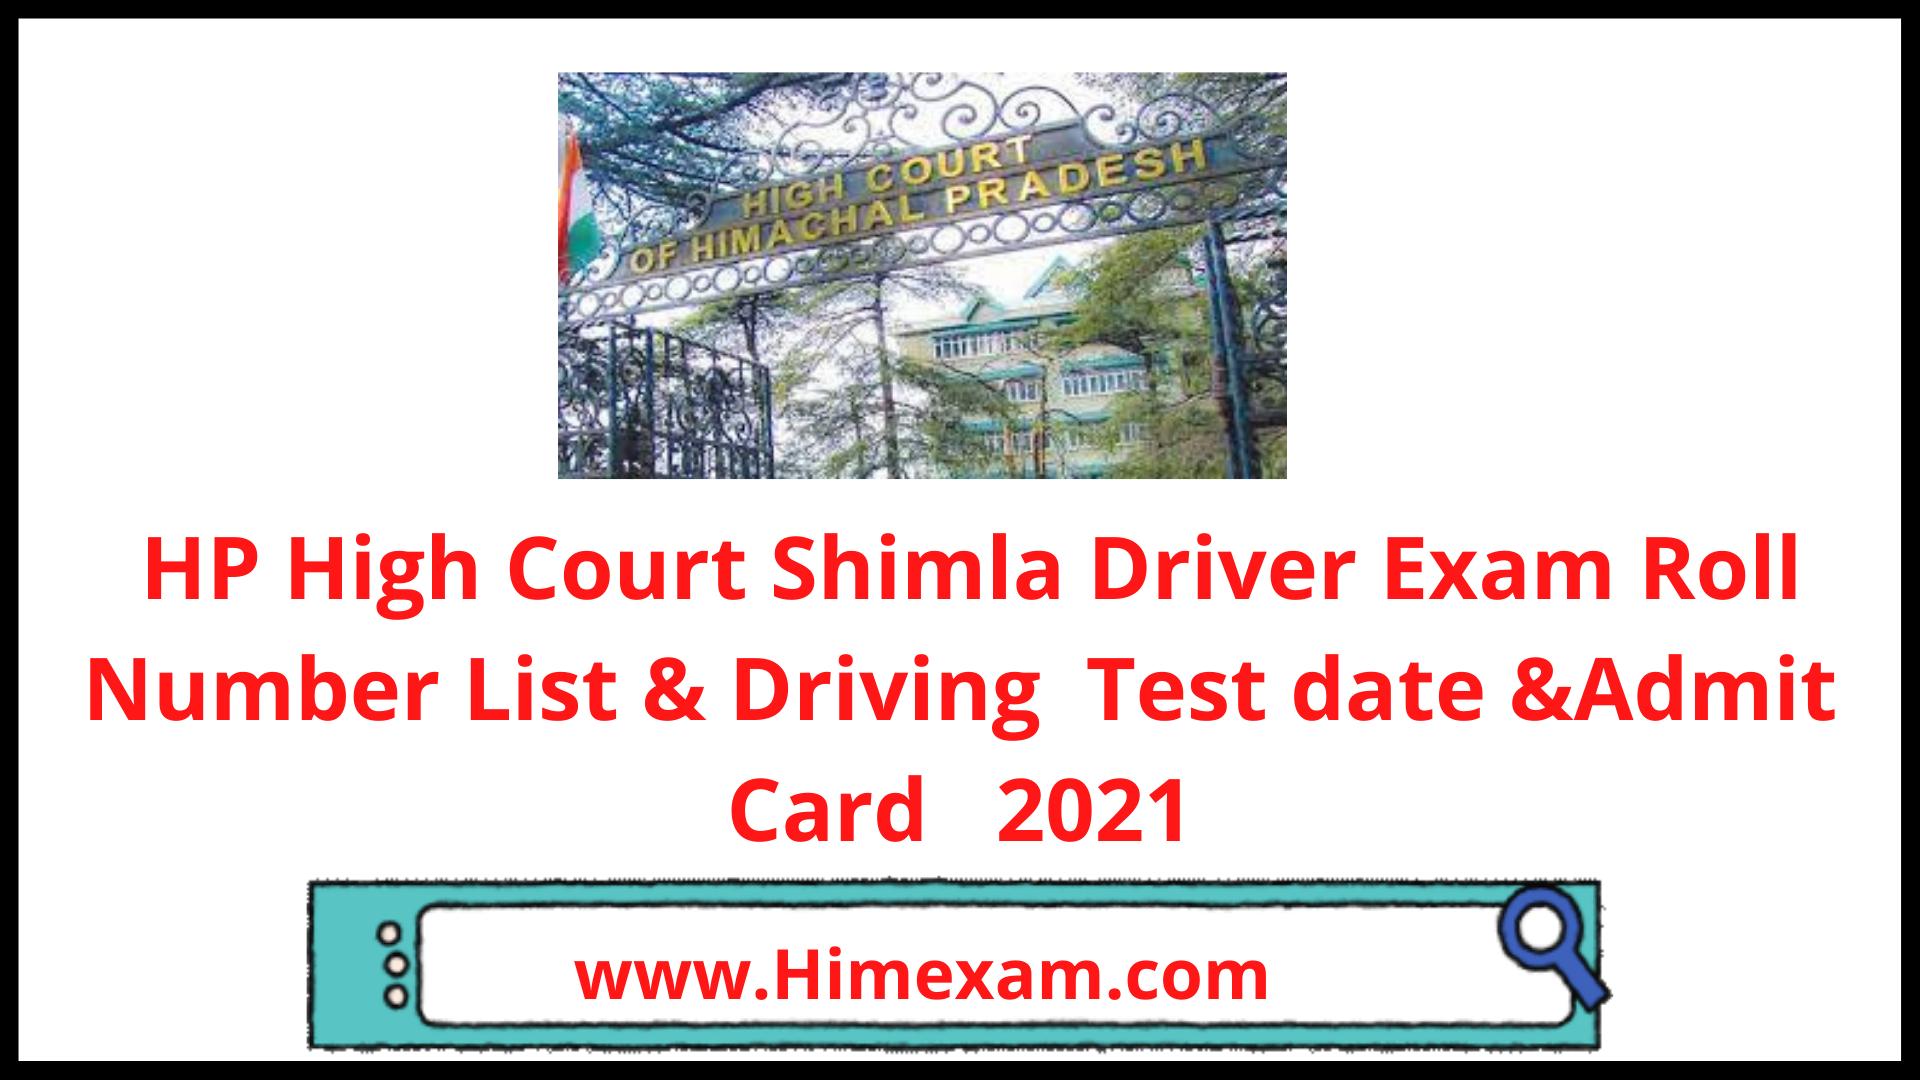 HP High Court Shimla Driver Exam Roll Number List & Exam date 2021